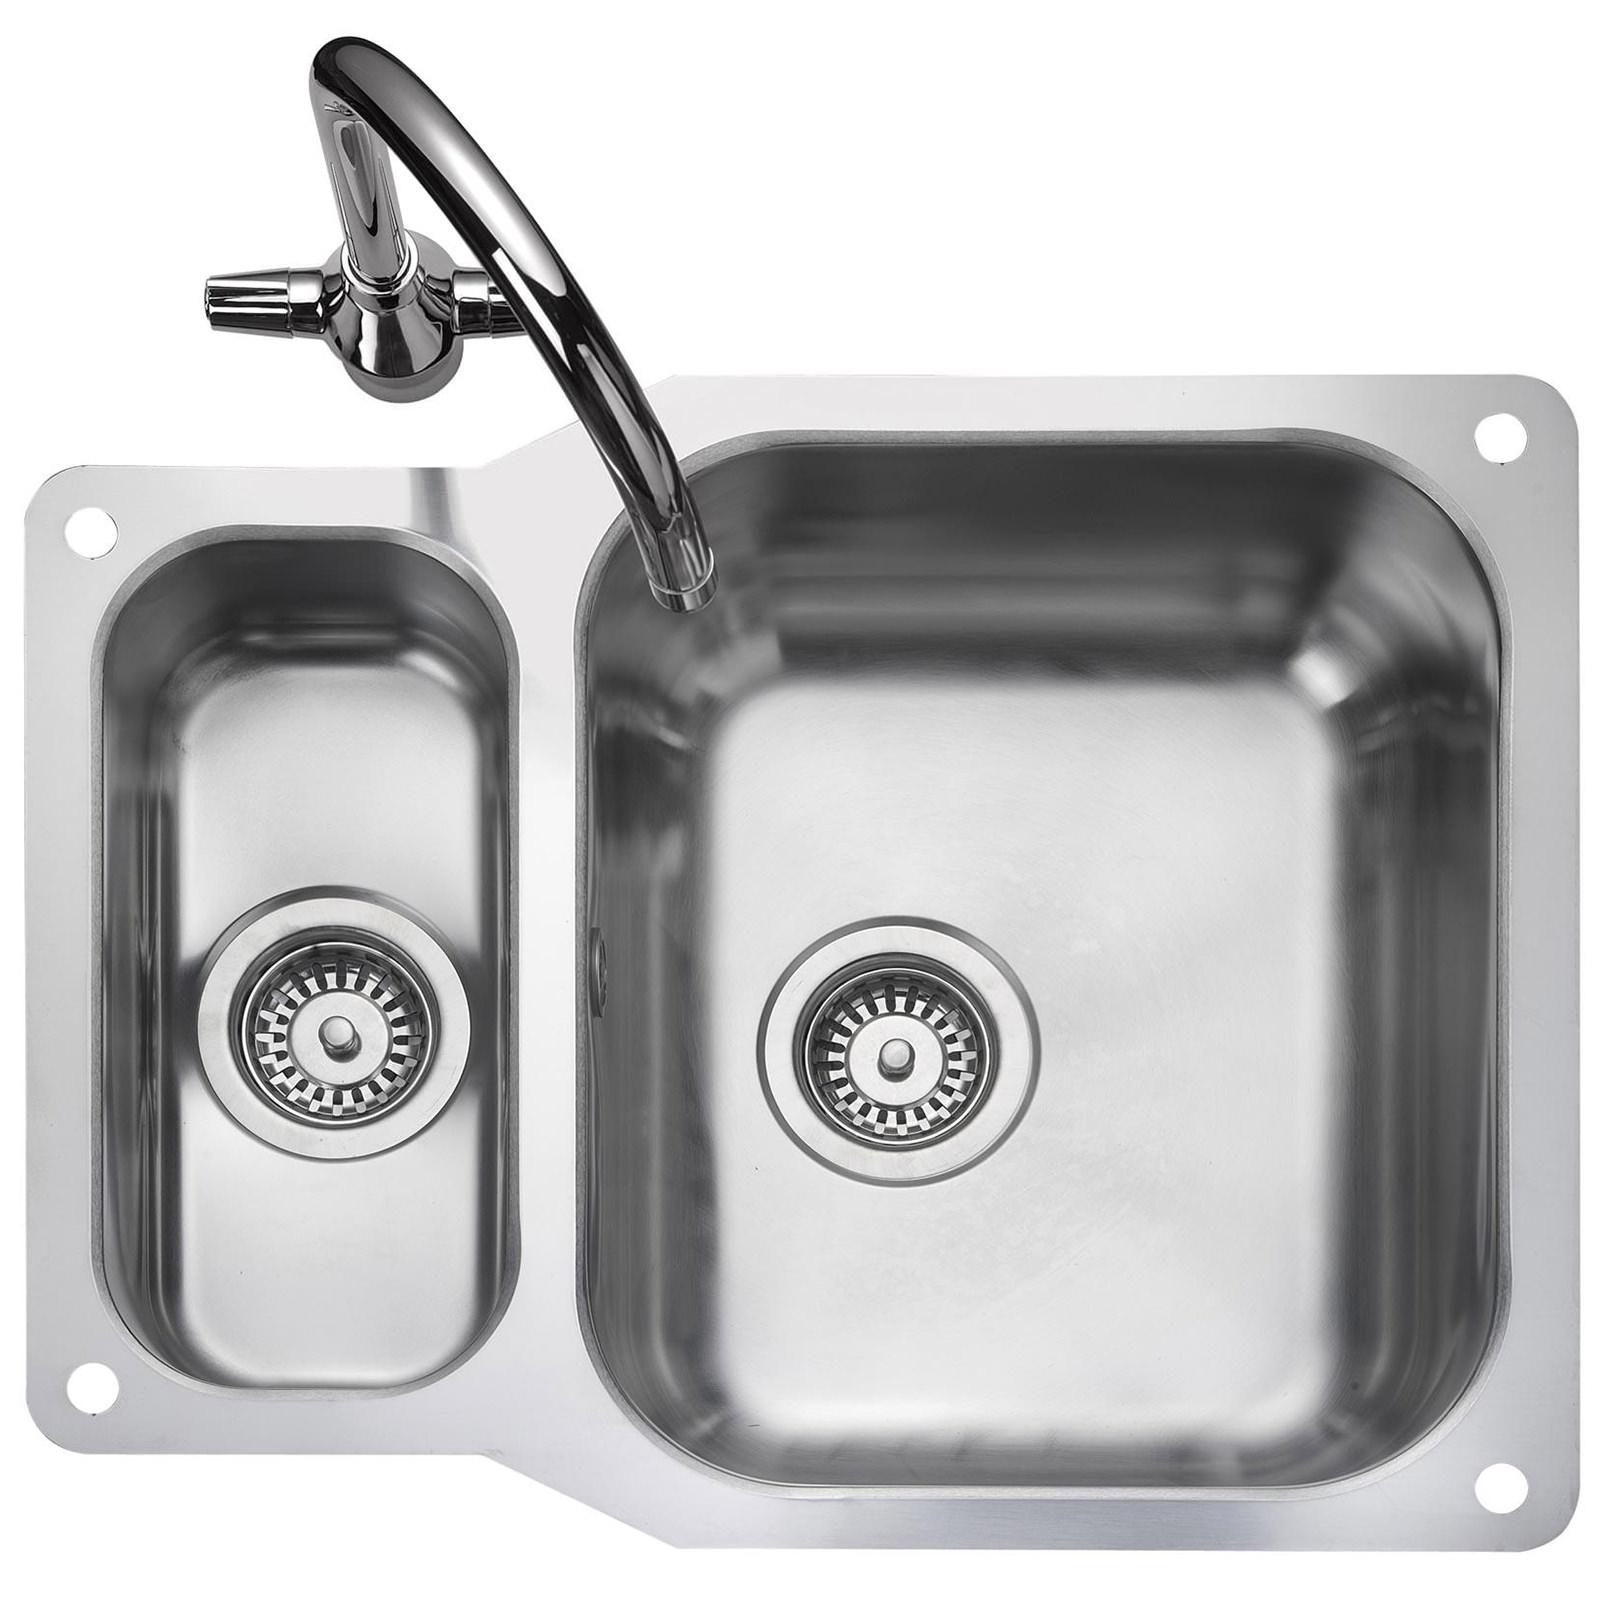 rangemaster atlantic classic 1 5 bowl undermount kitchen sink reversible